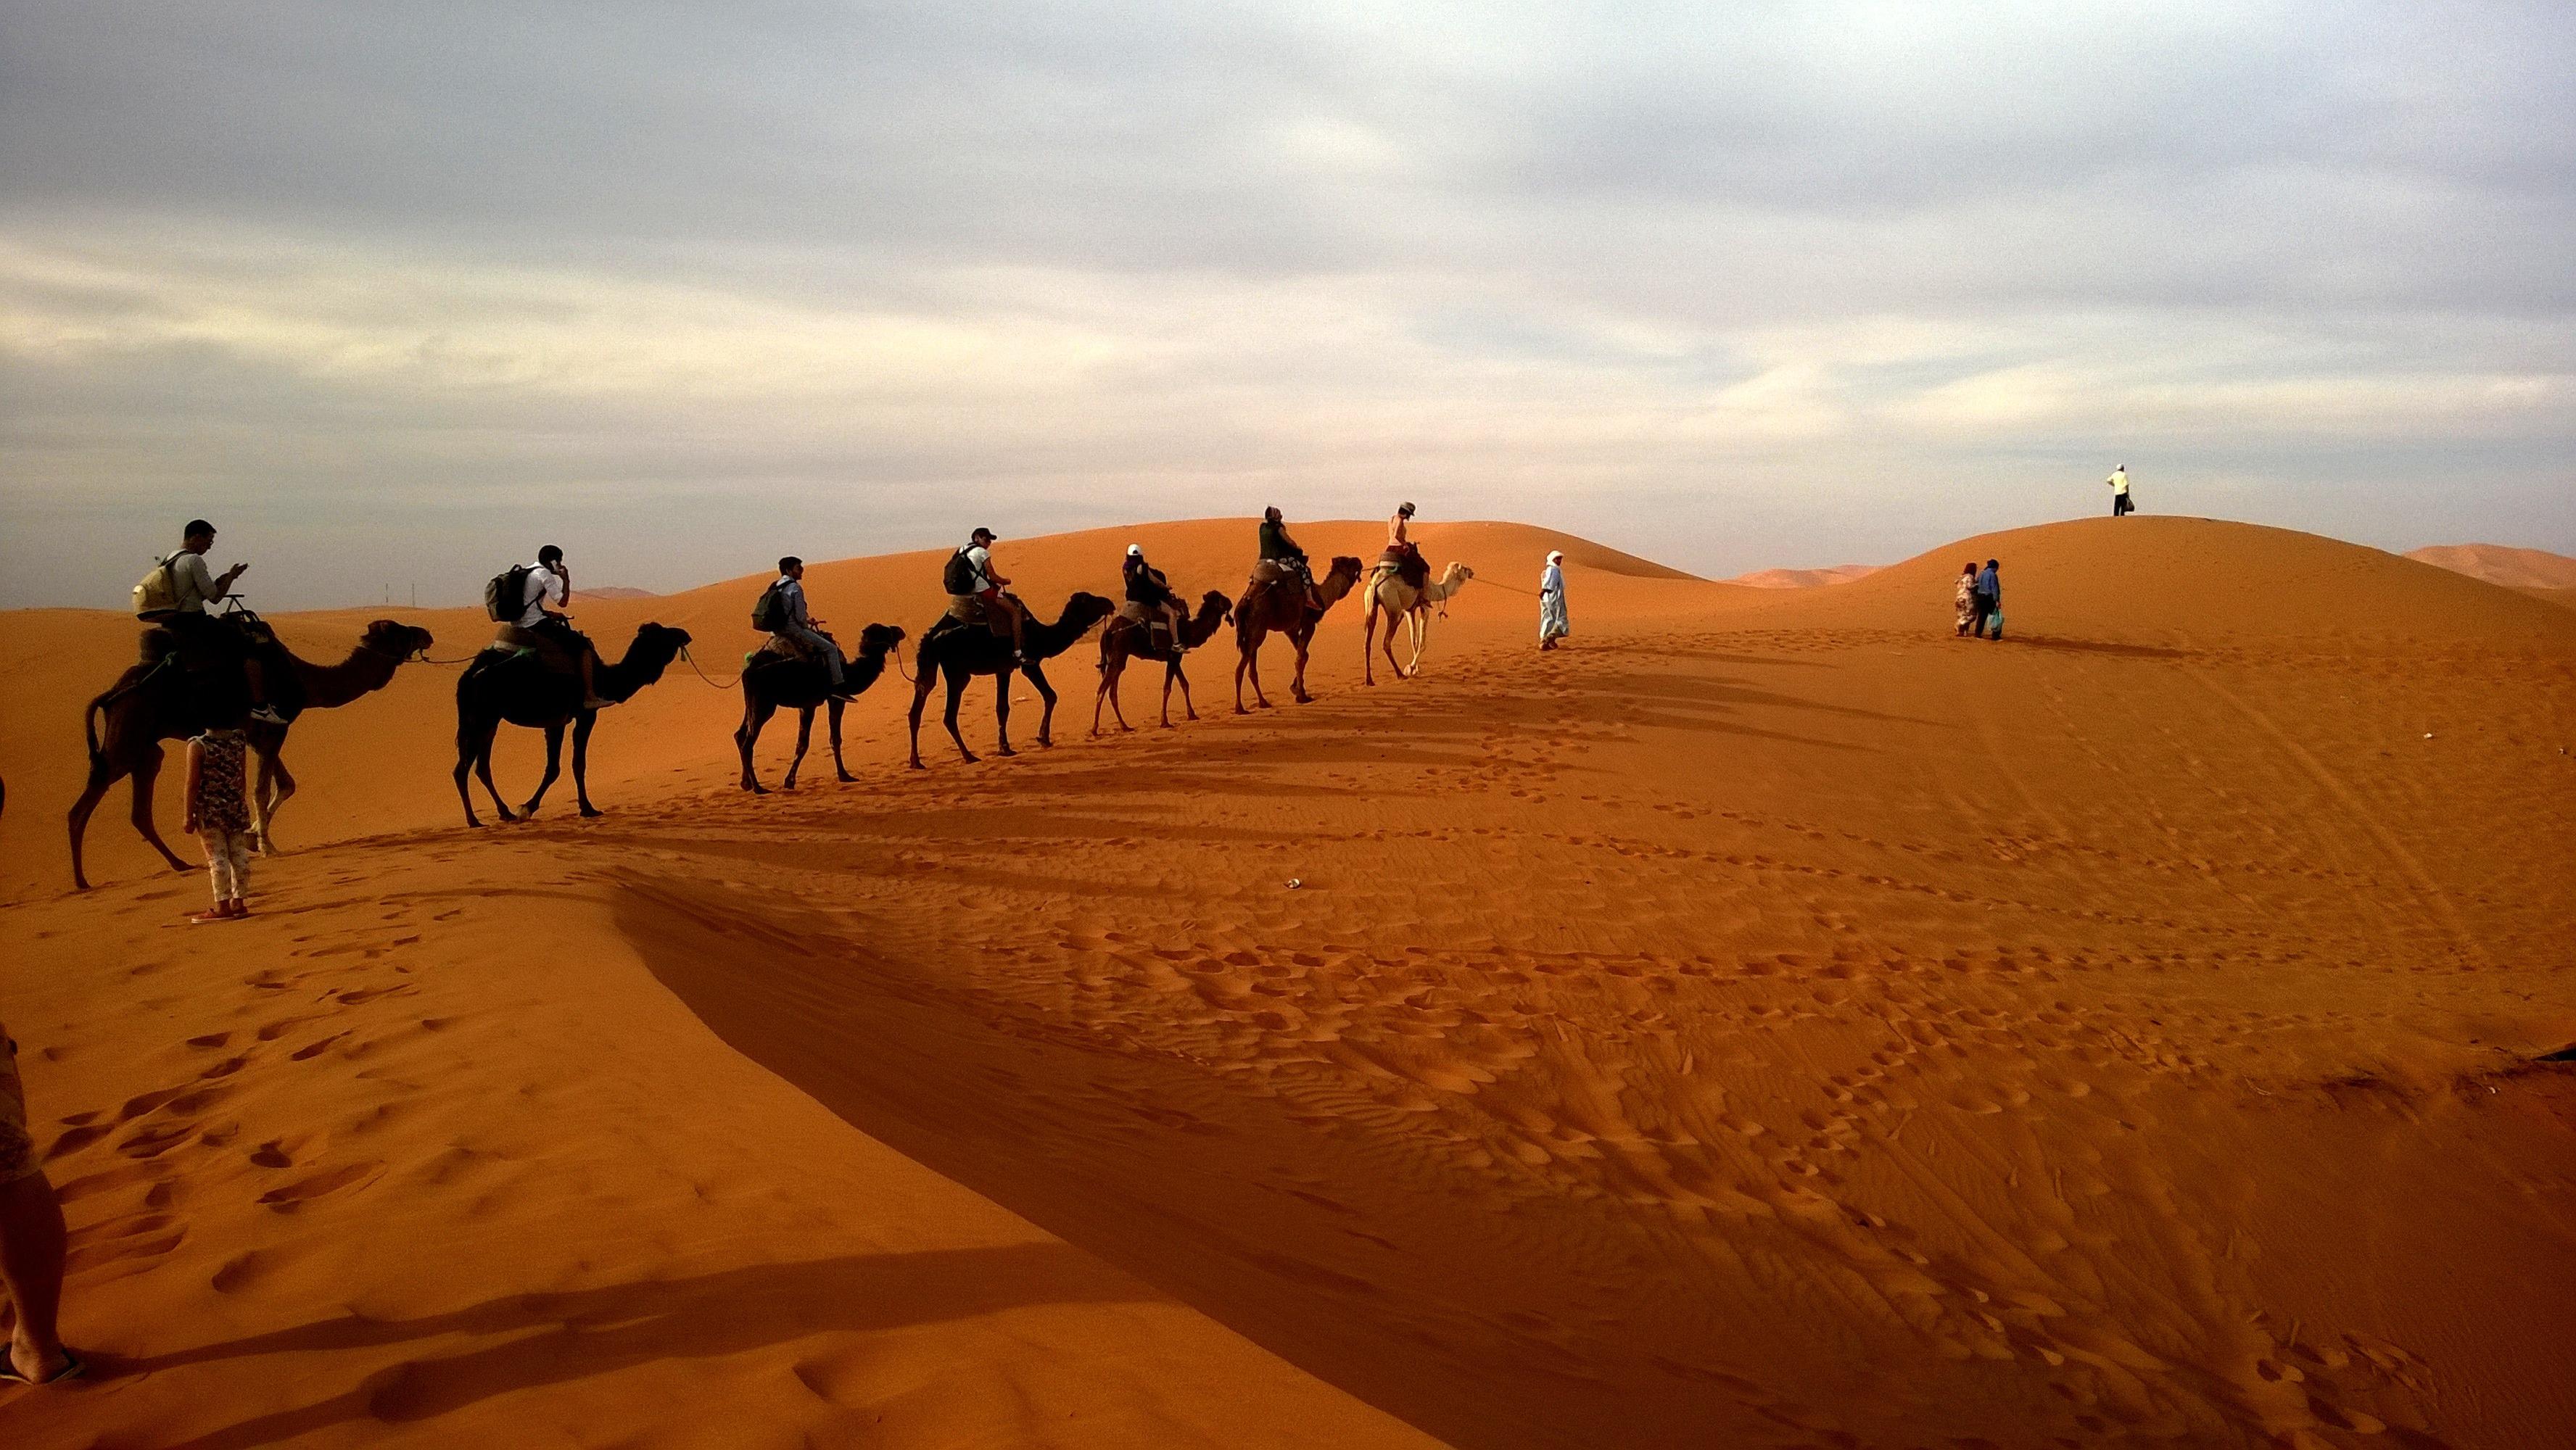 Camels Were Not Originally Desert Animals